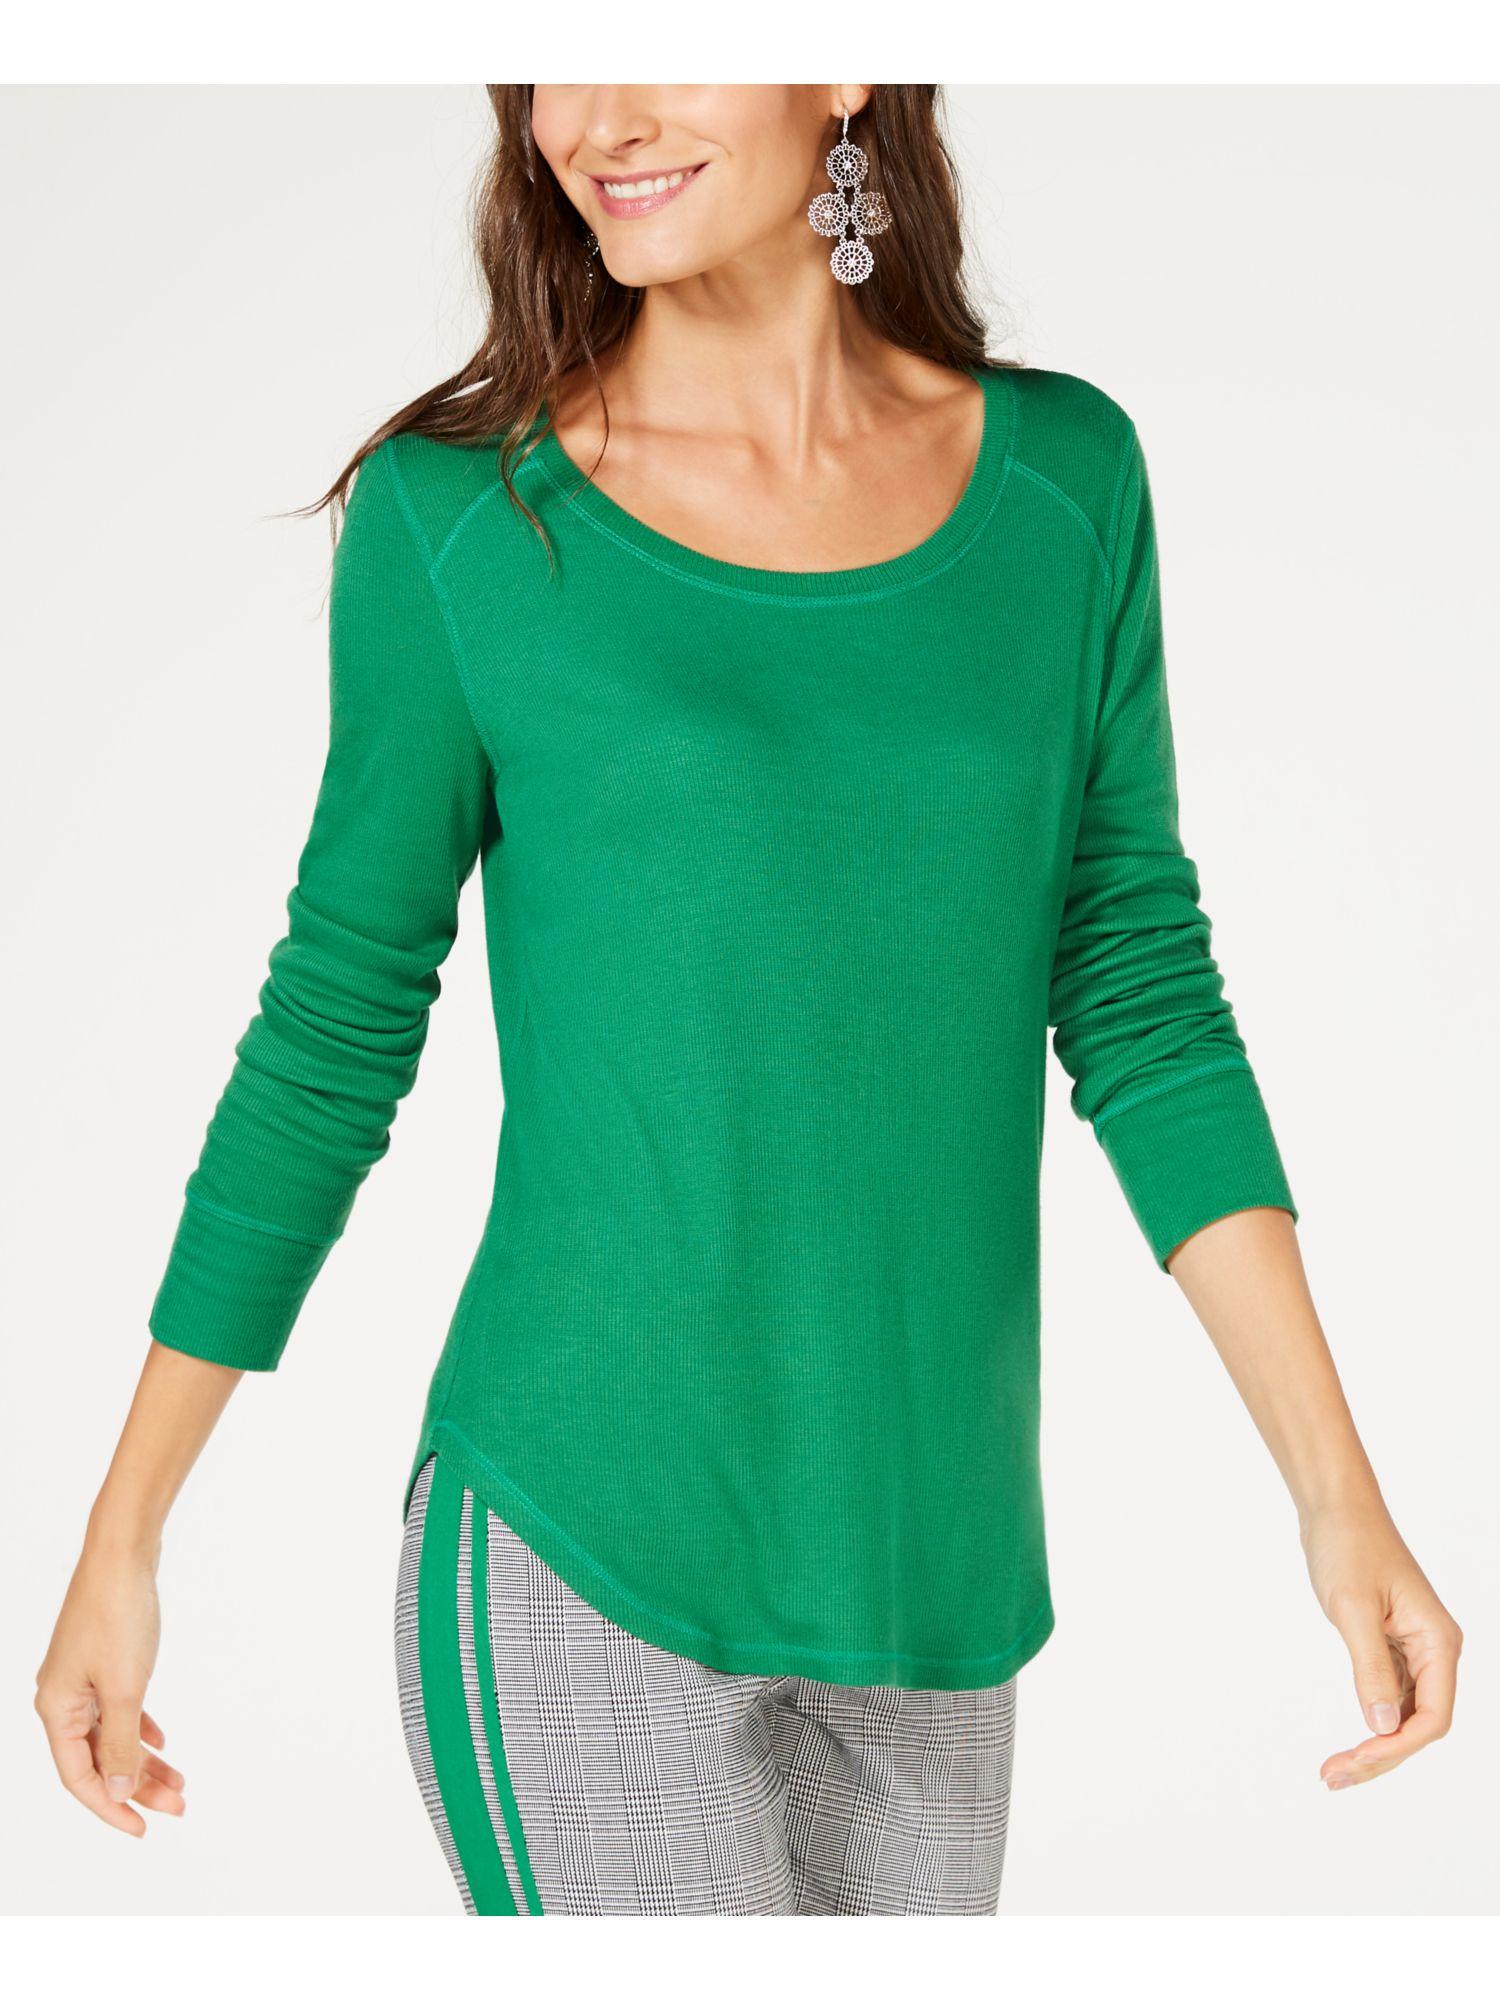 Green reptile inspired top size medium